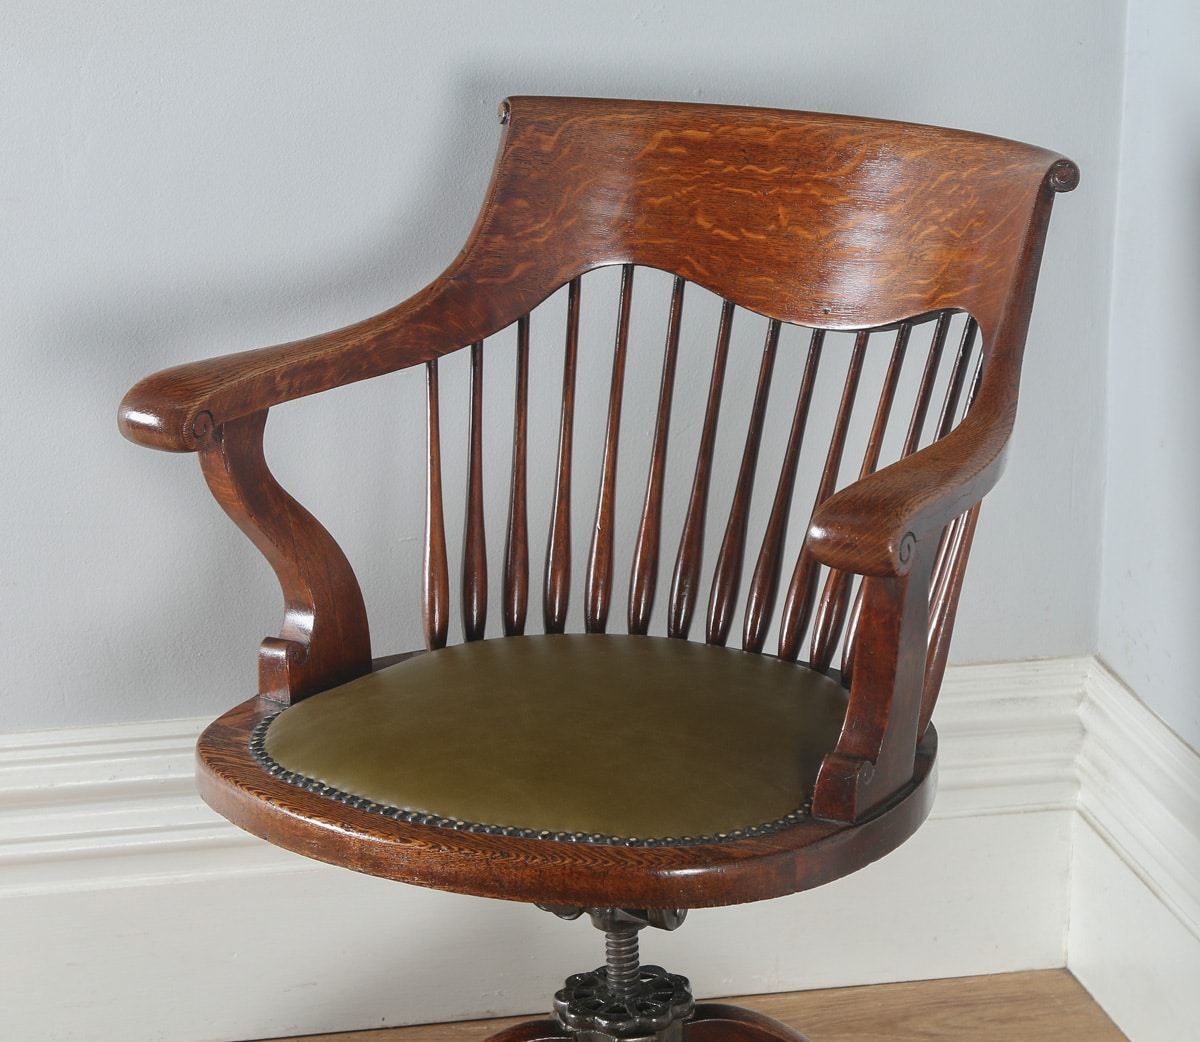 revolving chair in english best activity for baby antique edwardian oak swivel office desk